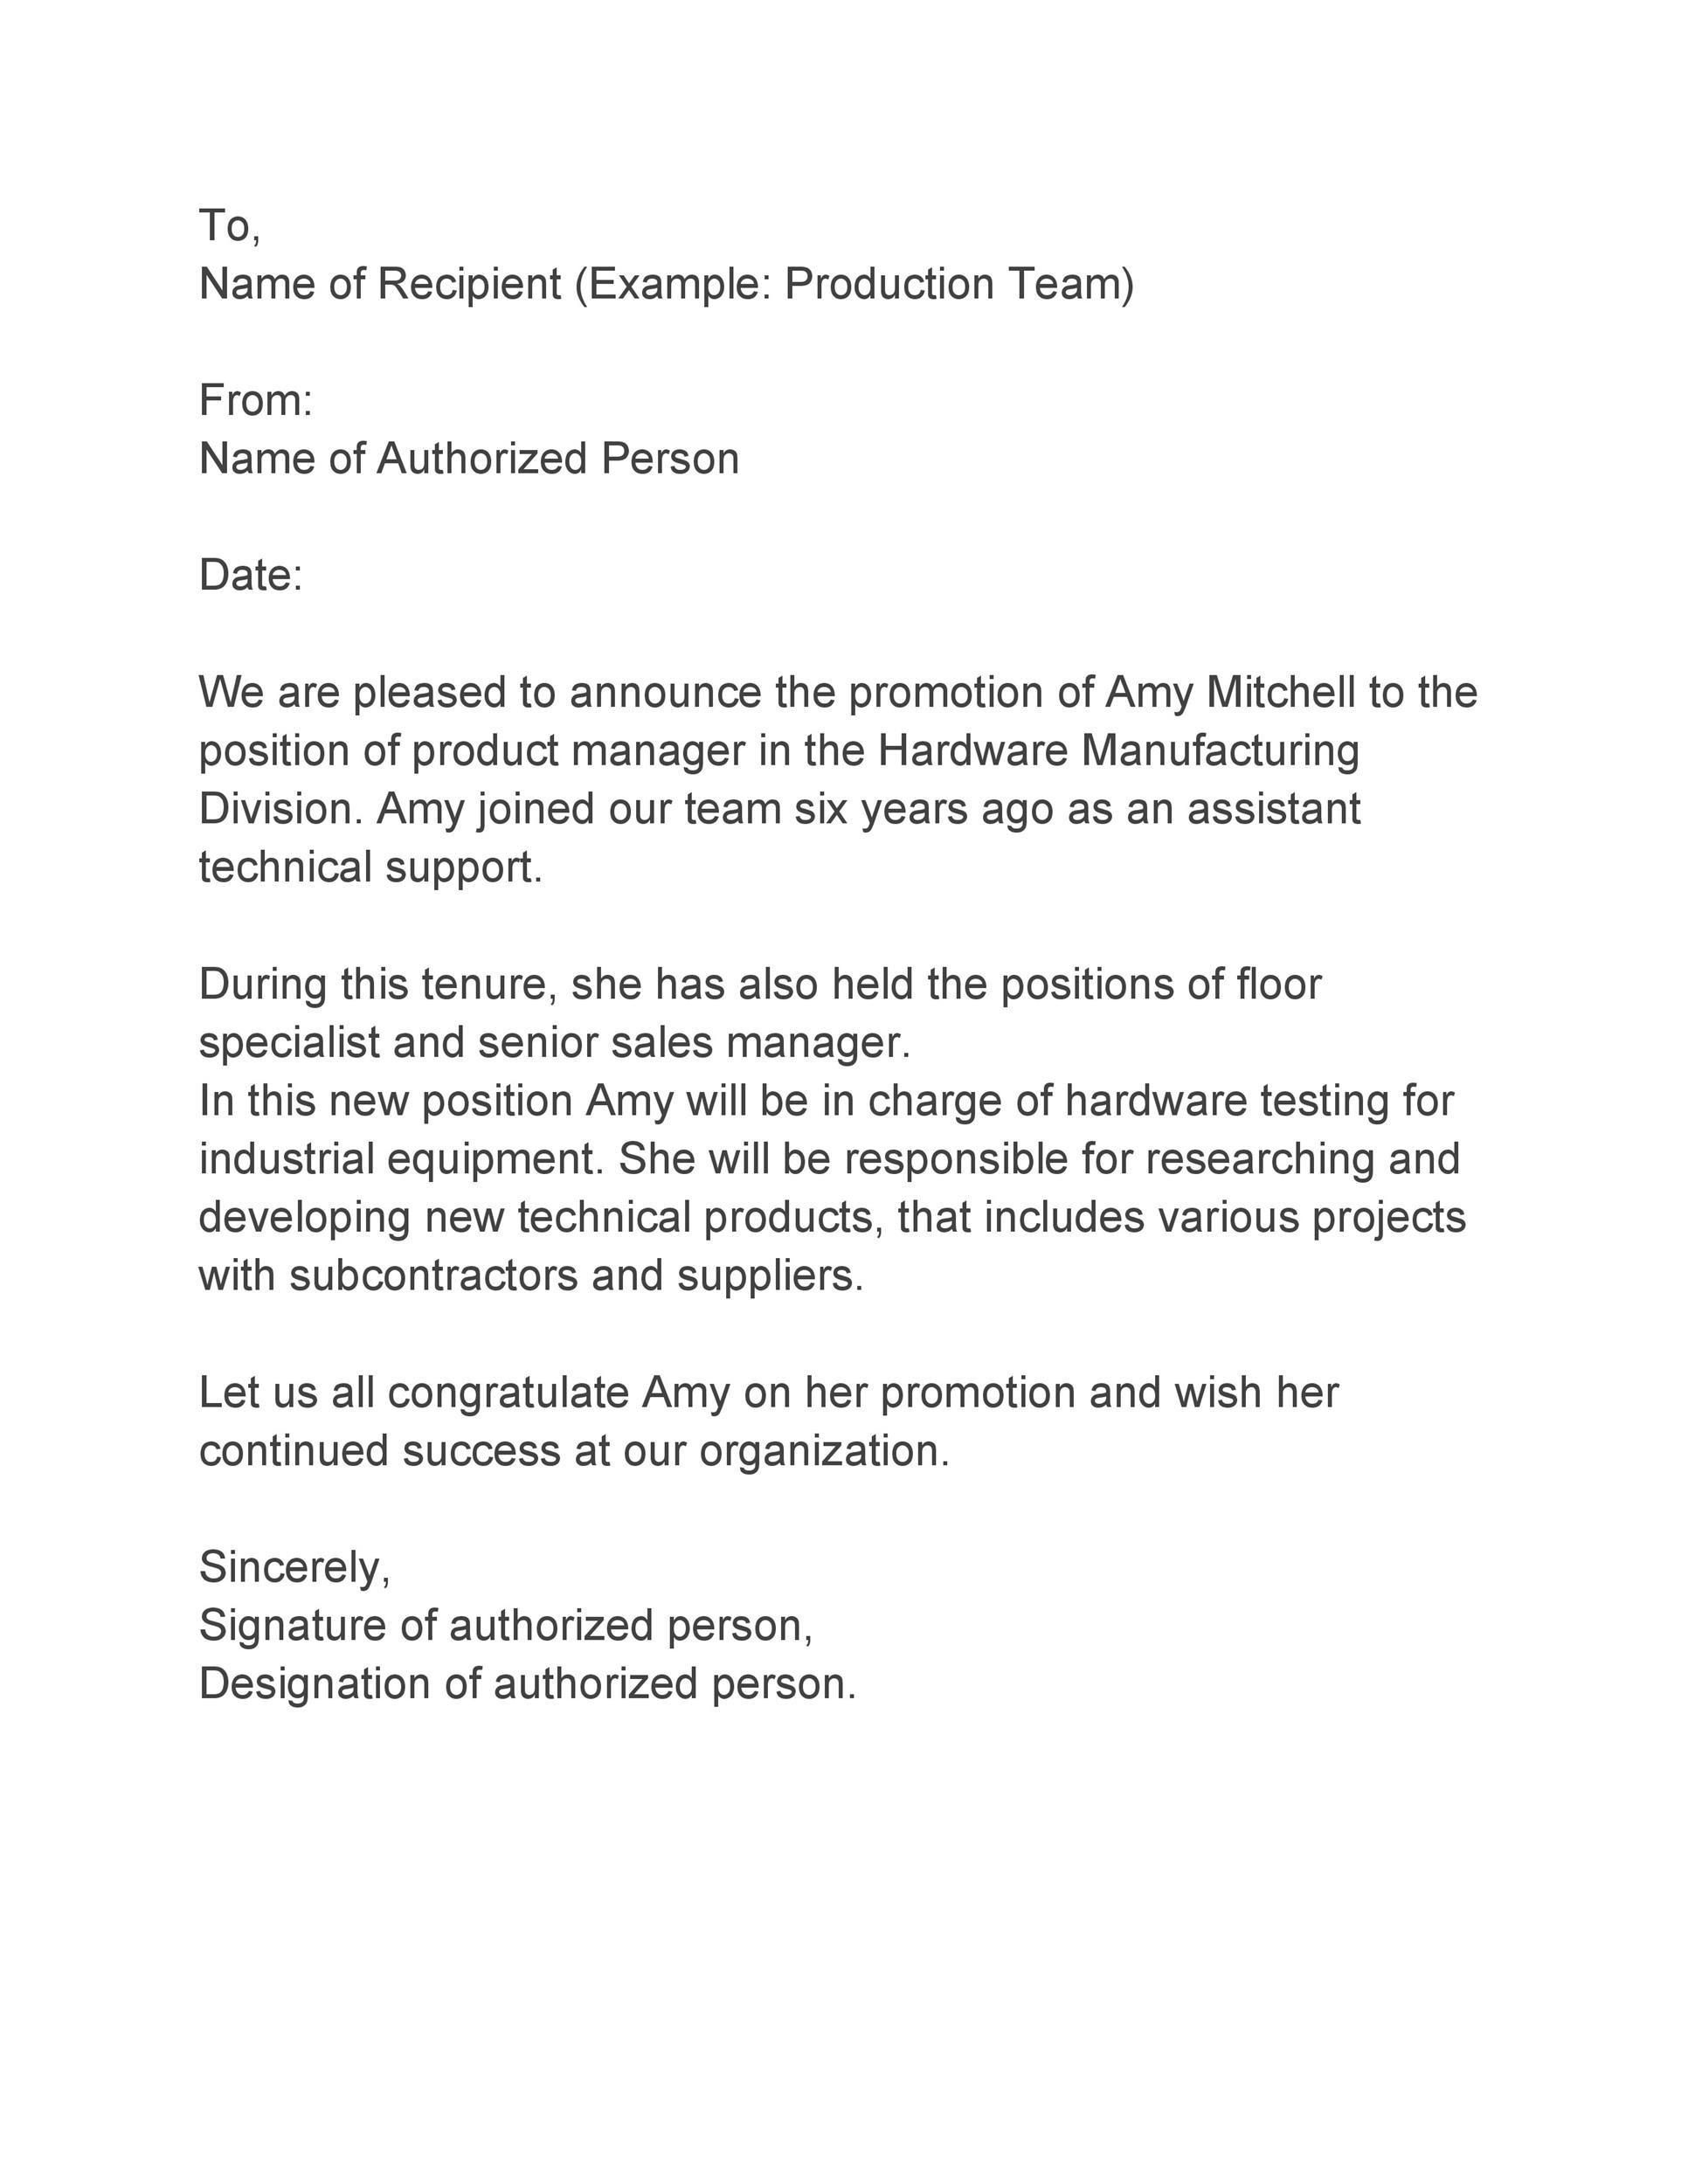 Free promotion letter 46